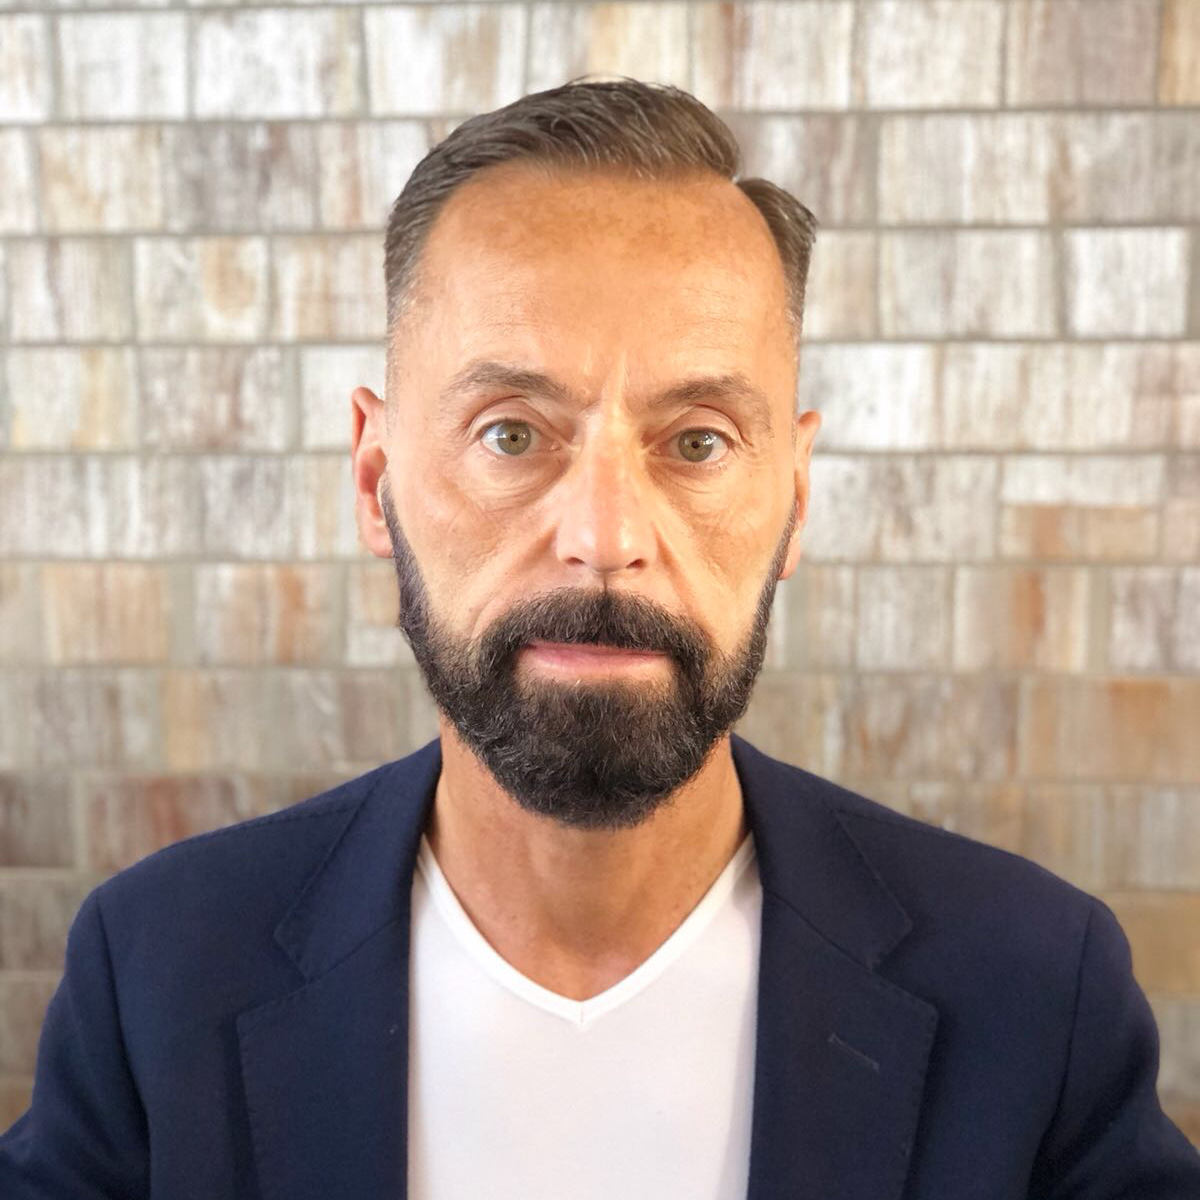 HDI Versicherungen: Giorgio Burrini, Friedrichring 27 in Freiburg im Breisgau